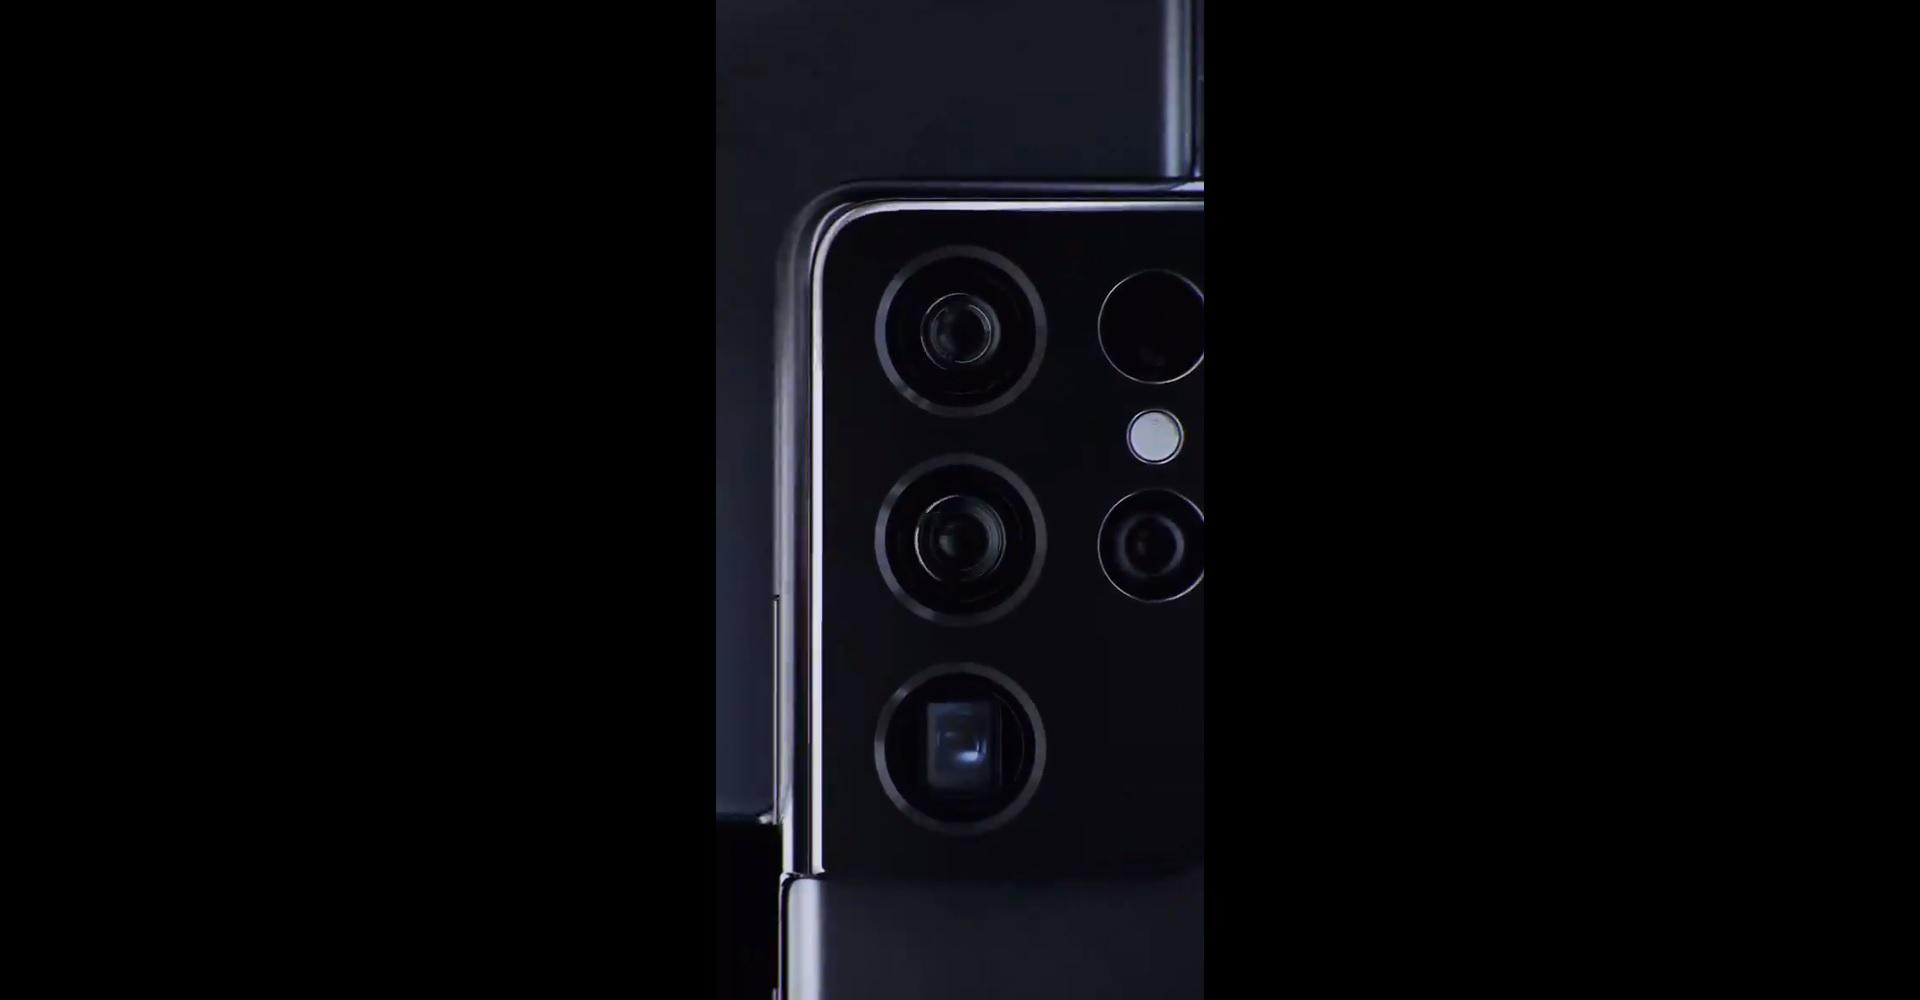 smartfon Samsung Galaxy S21 Ultra 5G smartphone teaser promo